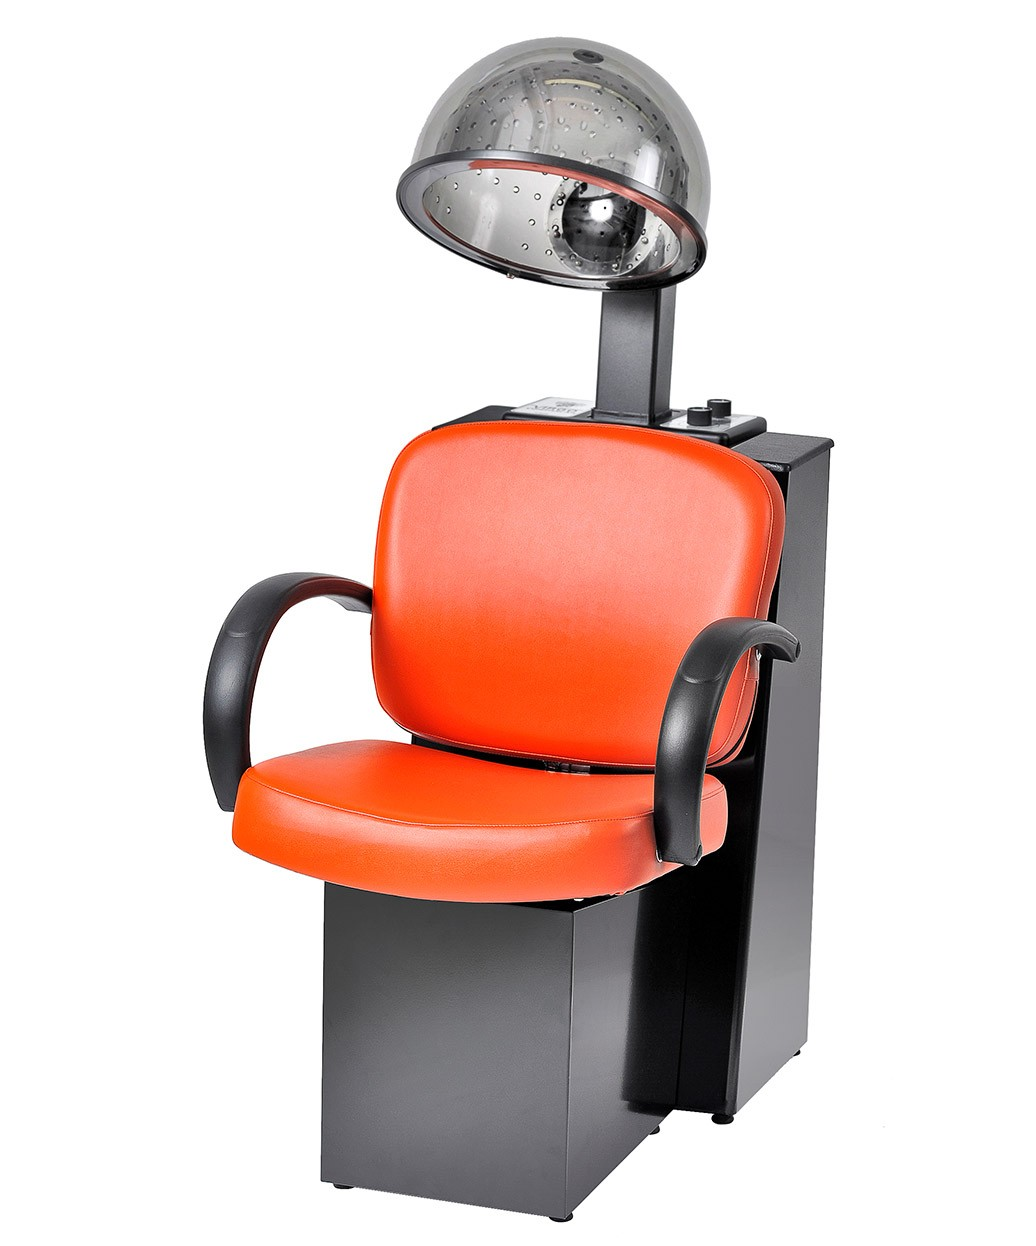 dryer chairs salon wedding chair covers perthshire pibbs 3669 messina